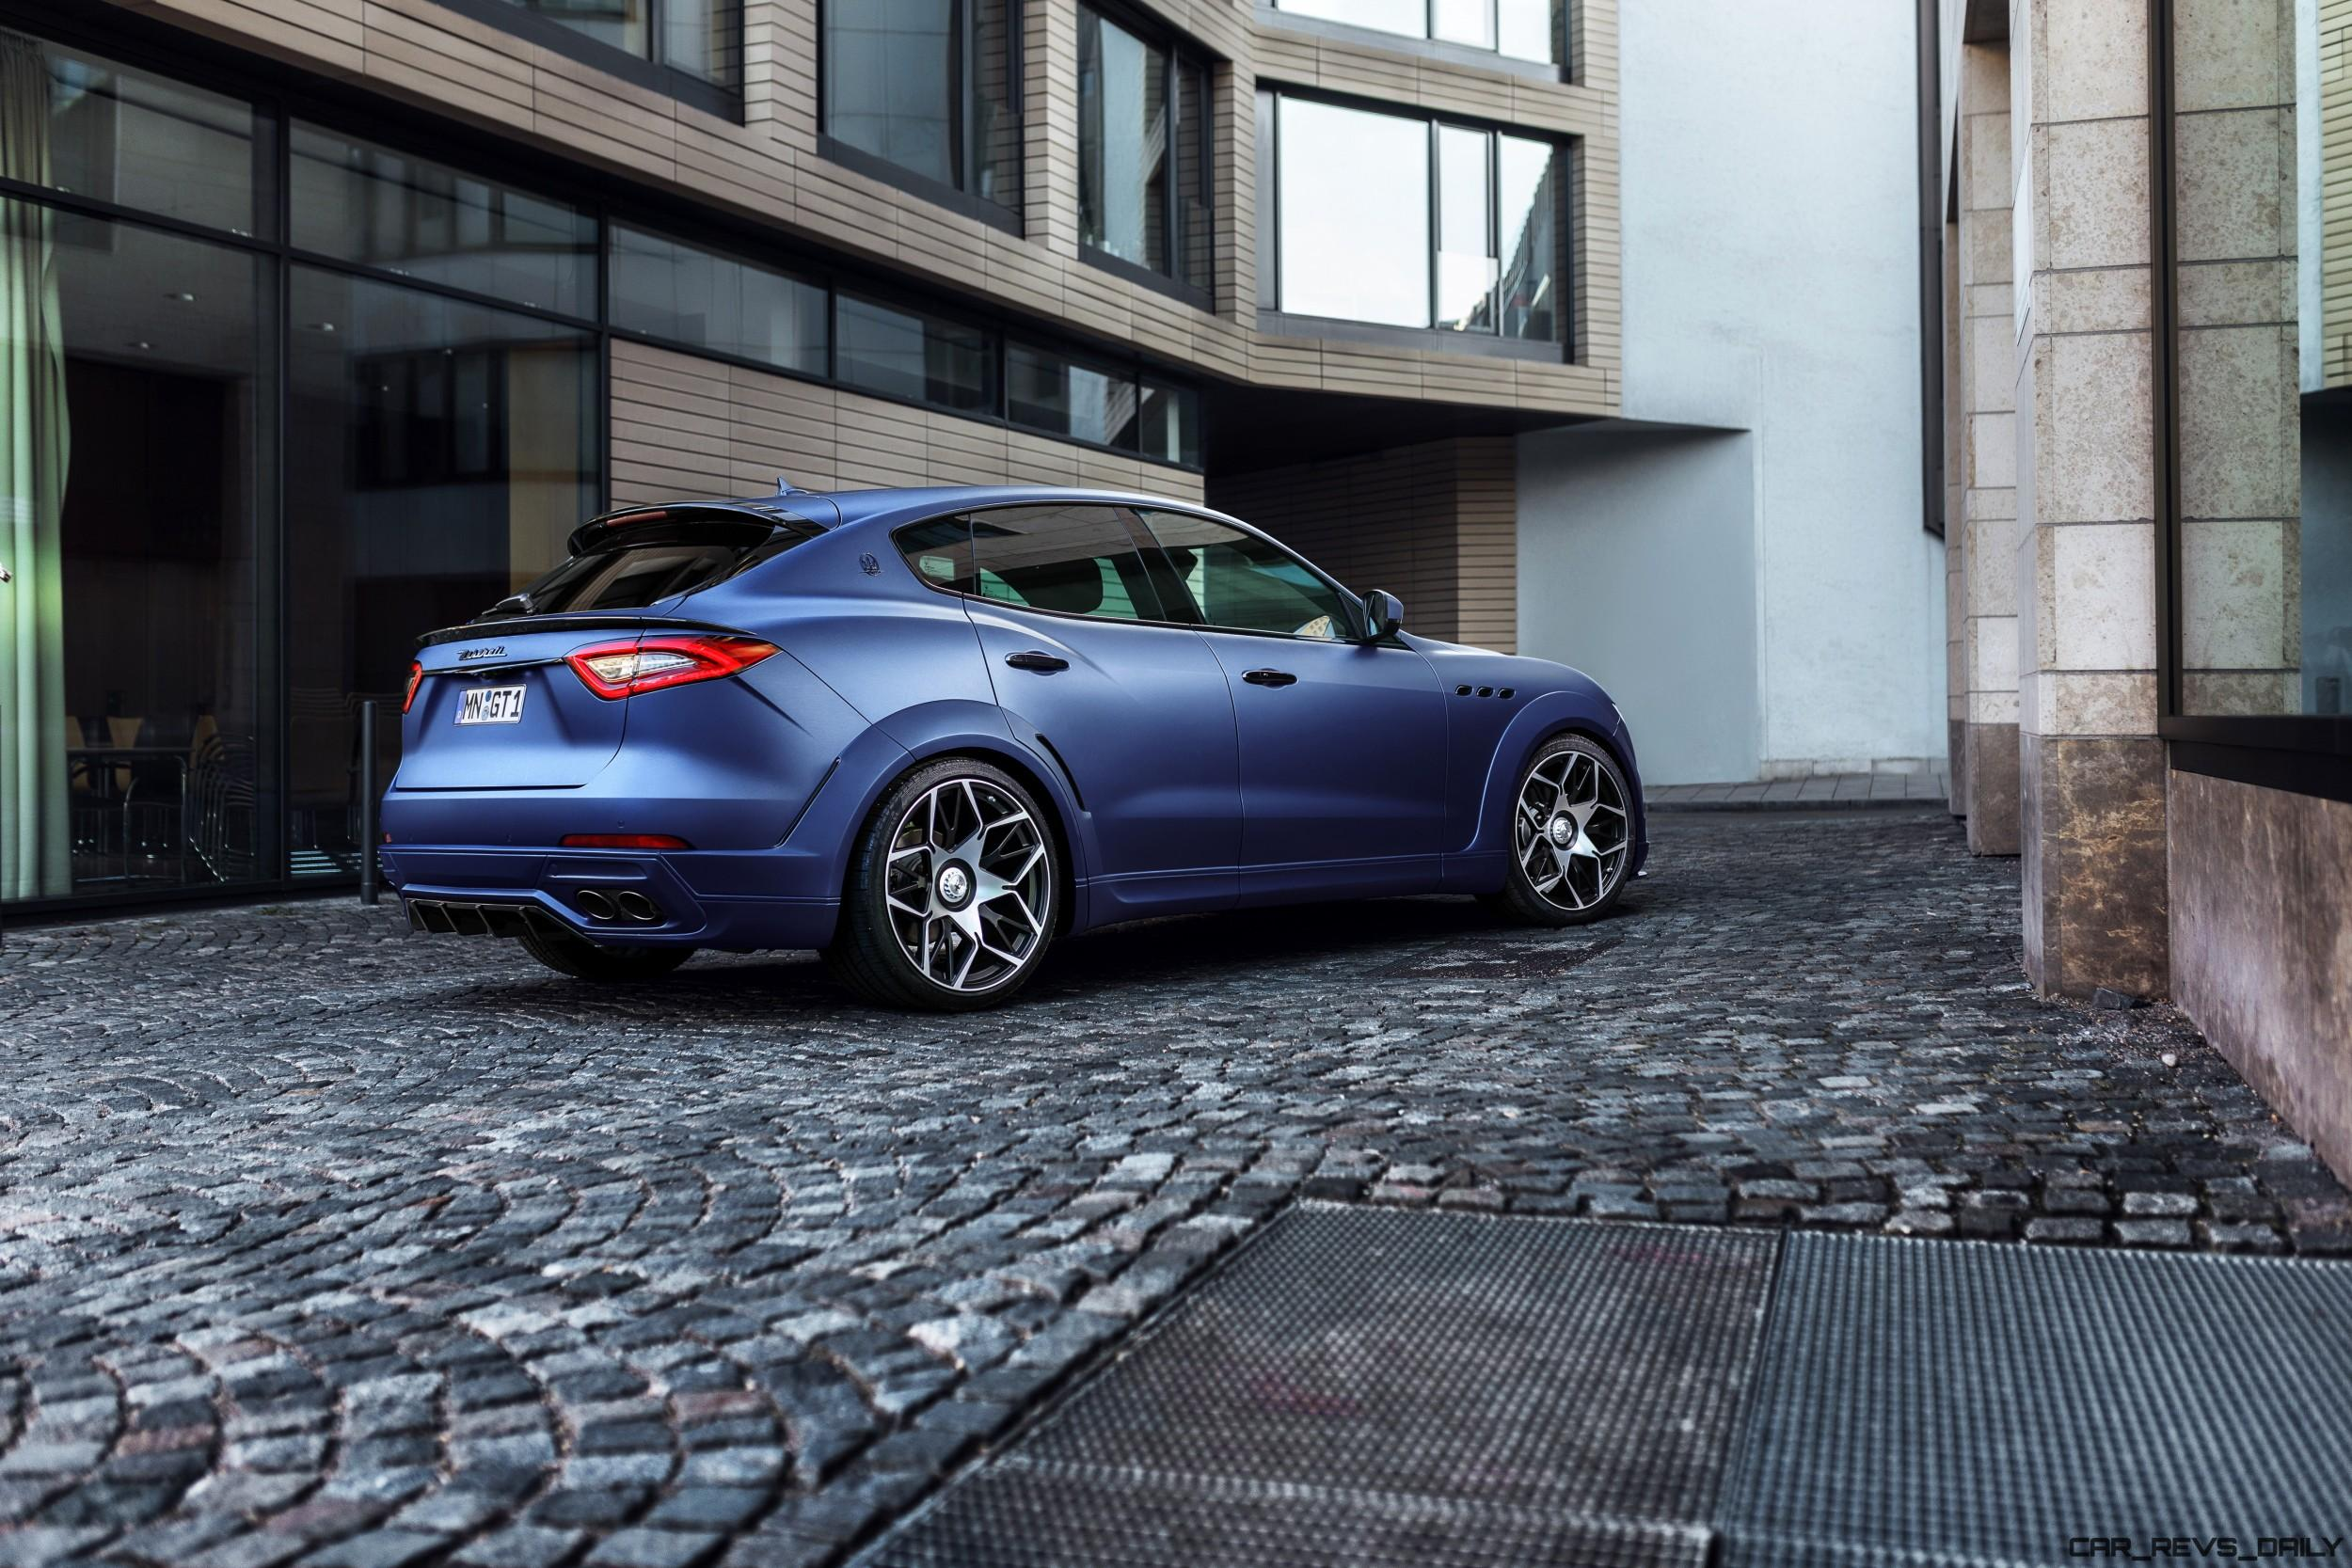 Car Rims And Tires Wallpaper Novitec Esteso Is Designer Widebody Maserati Levante 187 Car